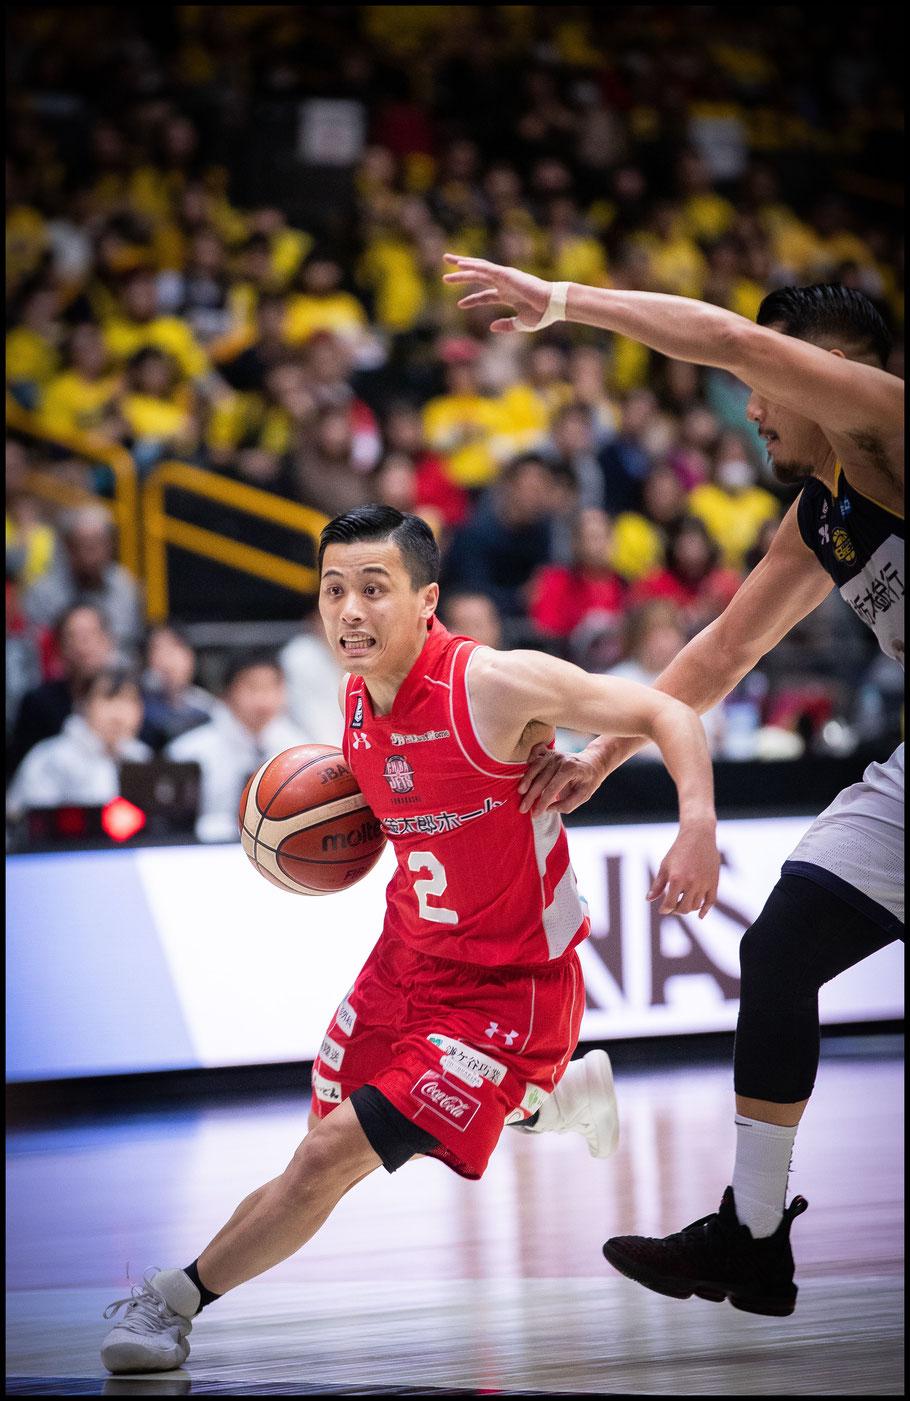 Takashi Ono's 18 points powered Chiba to victory – Chris Pfaff, Inside Sport: Japan, Jan 8th, 2018